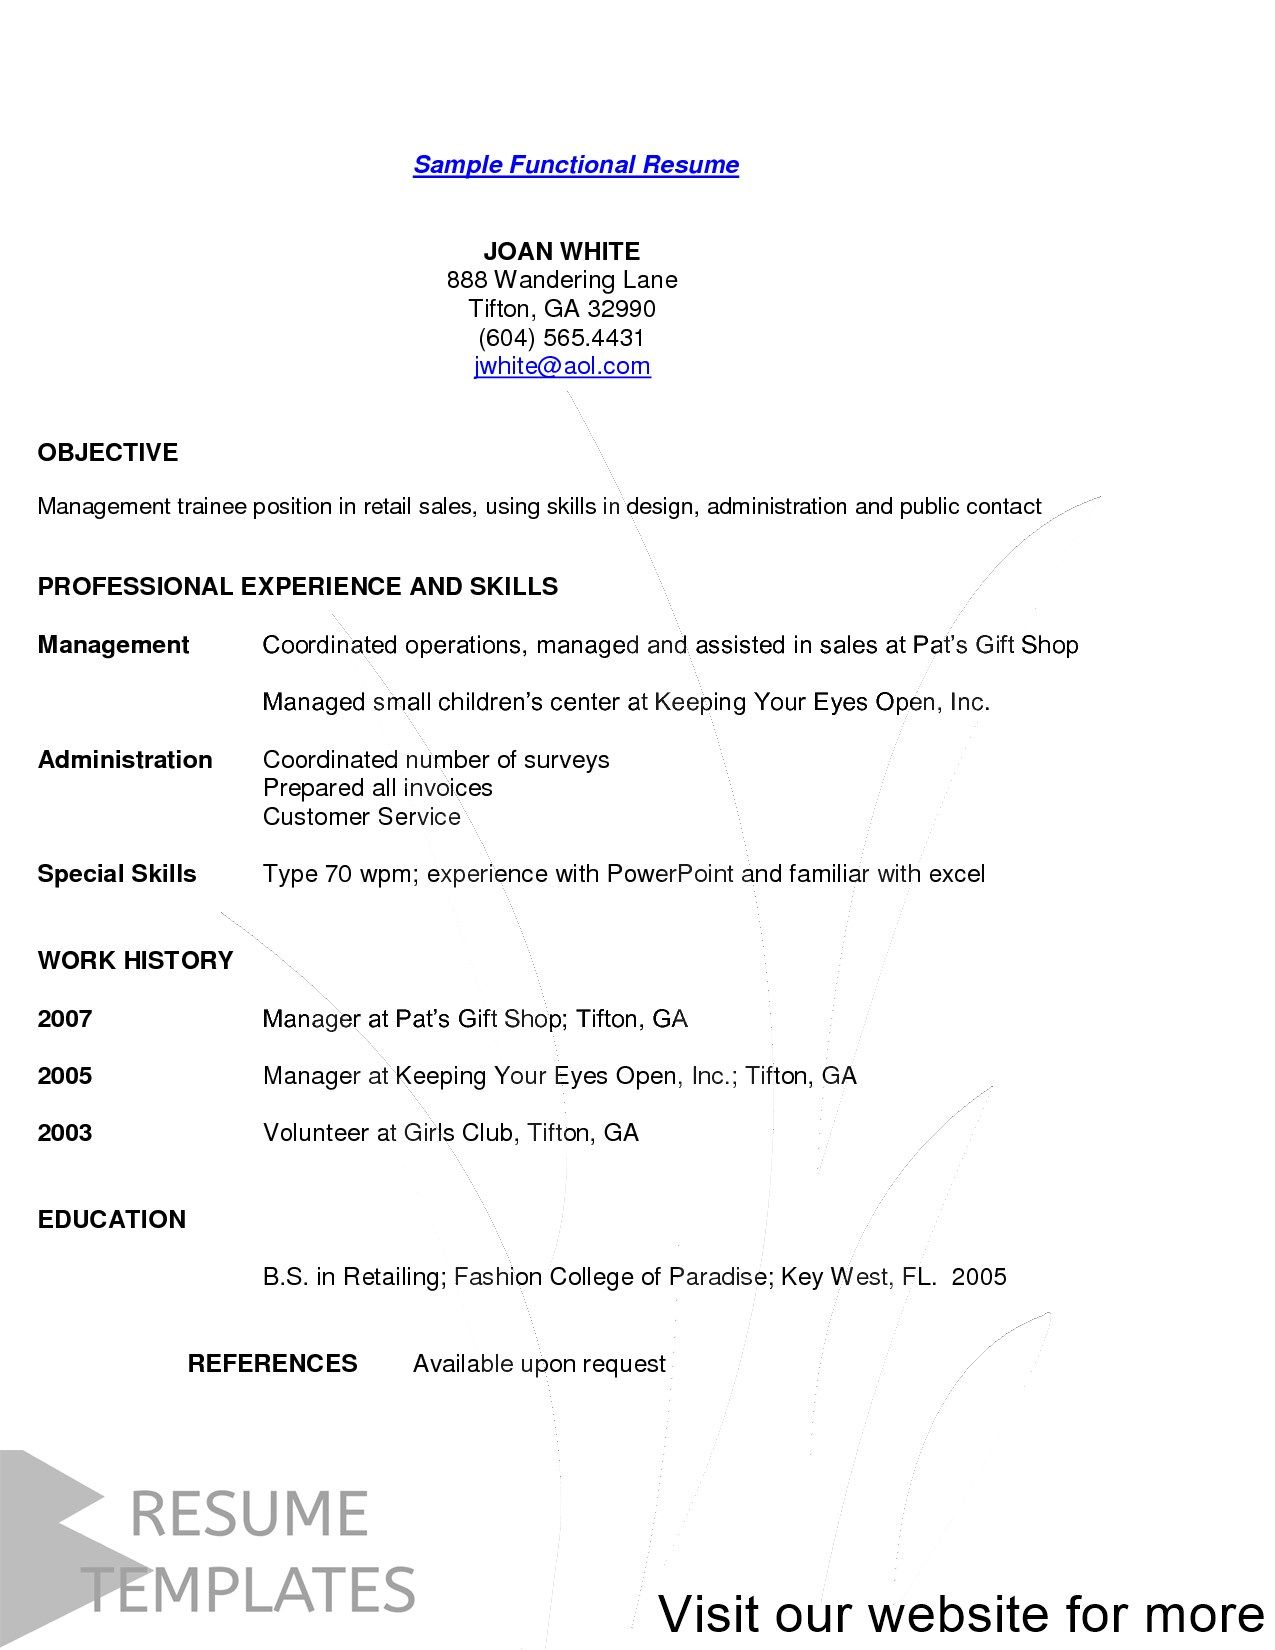 Resume Template Free Malaysia In 2020 Good Resume Examples Job Resume Template Resume Template Free